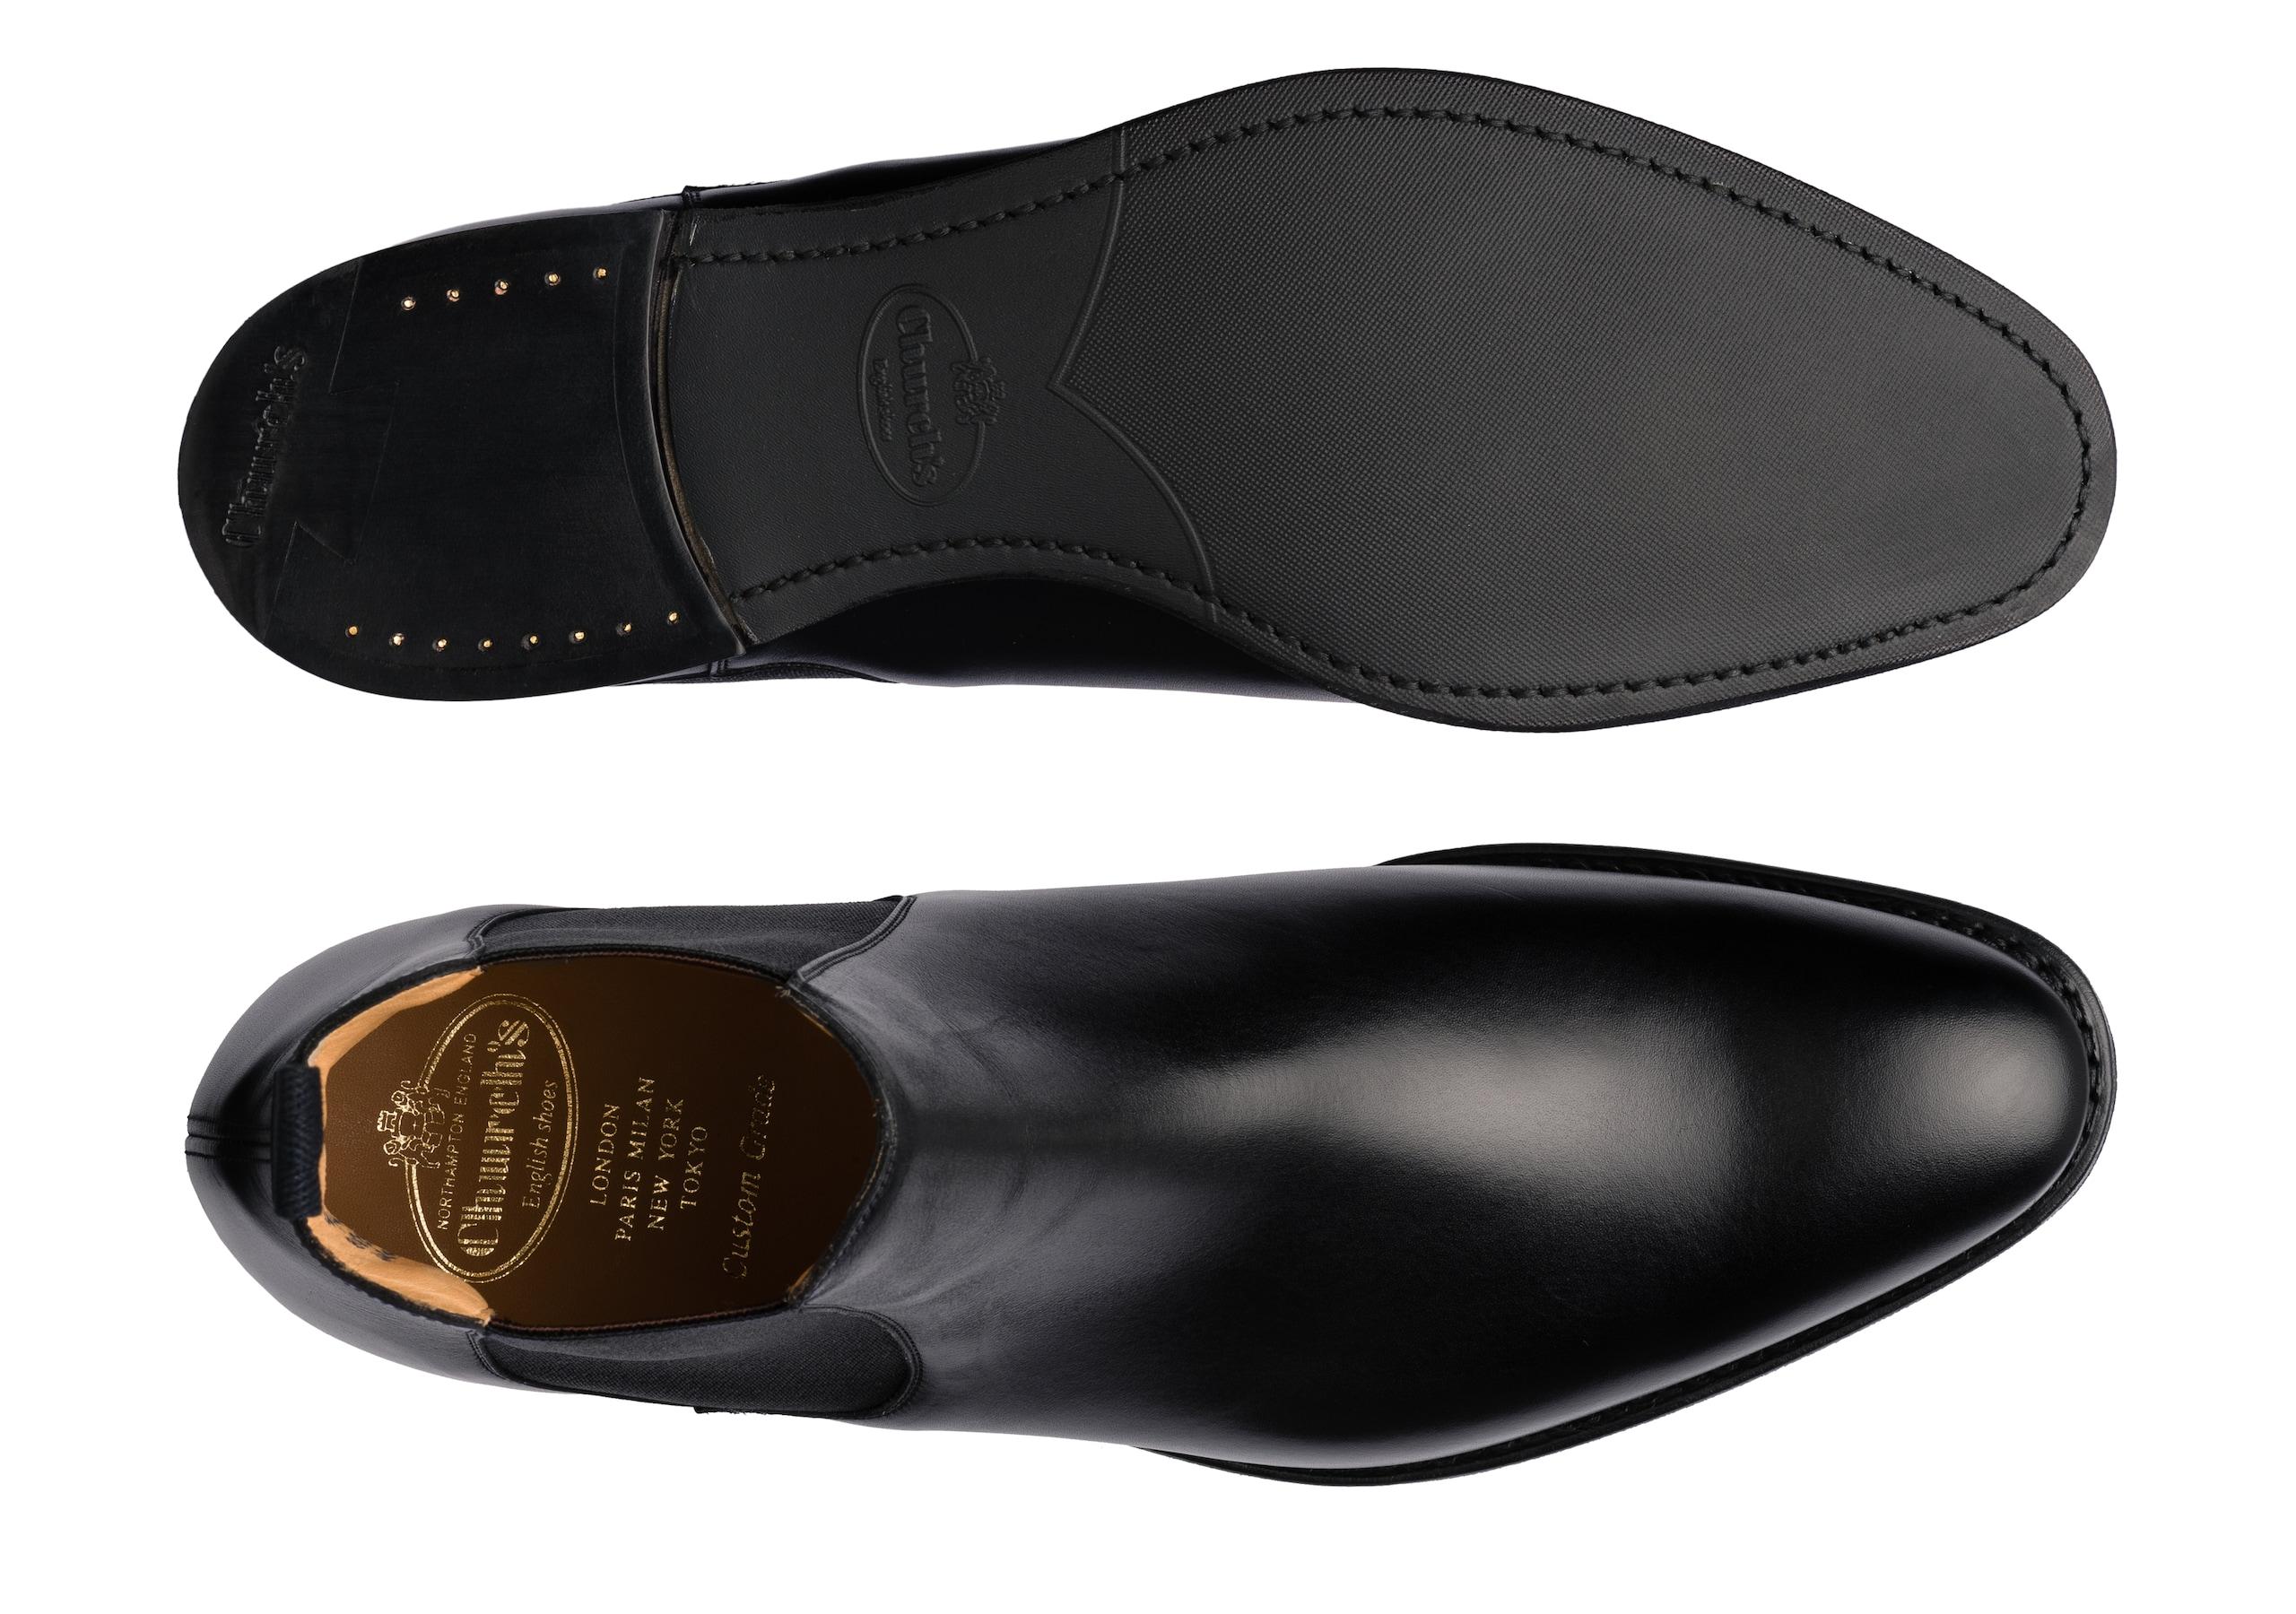 Houston r Church's Calf Leather Chelsea Boot Black